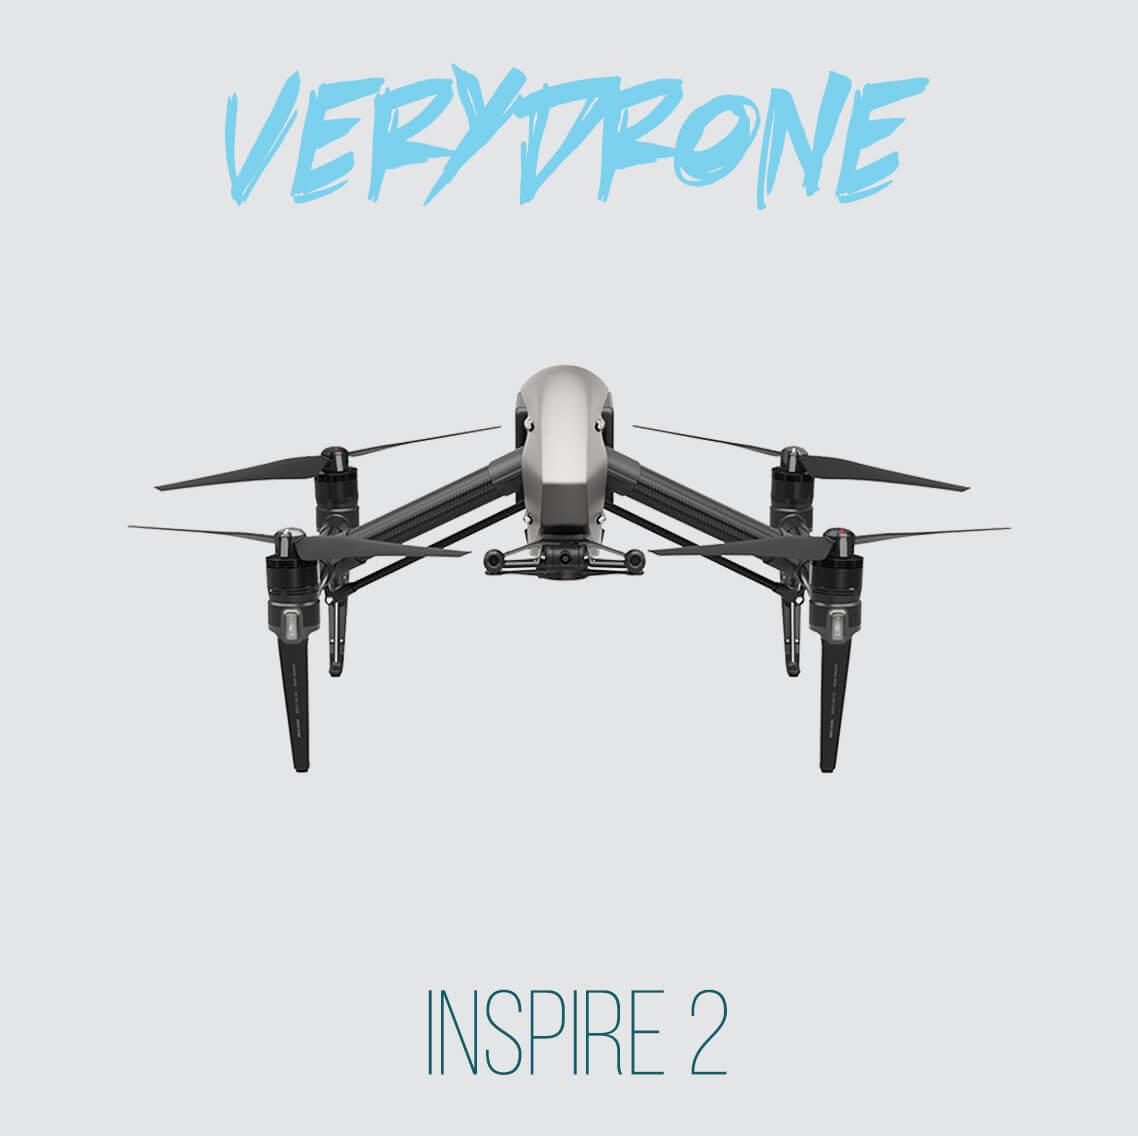 DJI Inspire 2